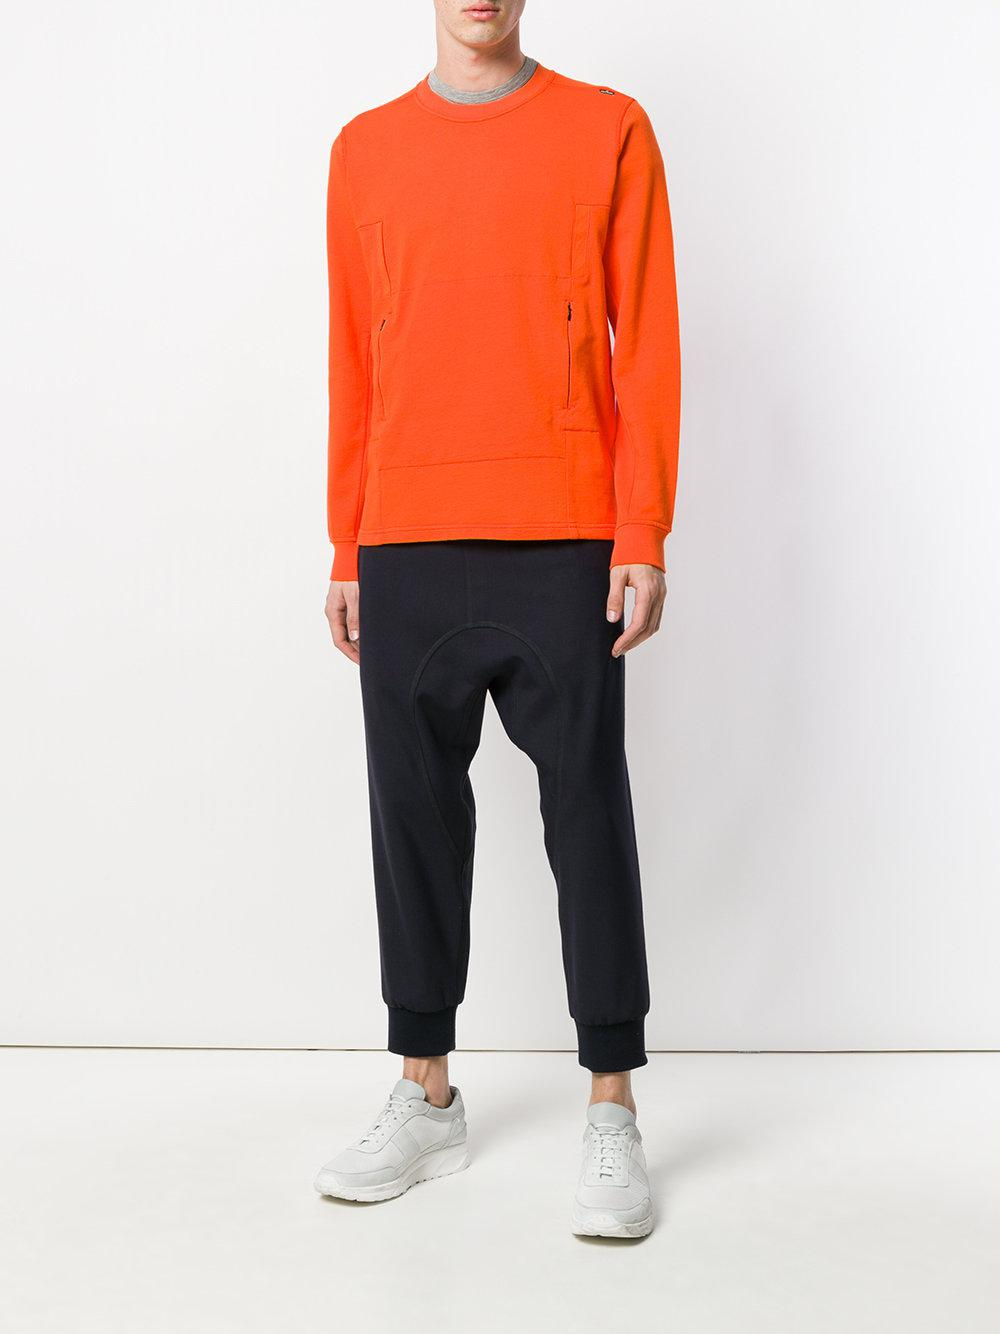 Stone Island Fleece Flank Pocket Crew Neck Sweatshirt in Yellow & Orange (Orange) for Men